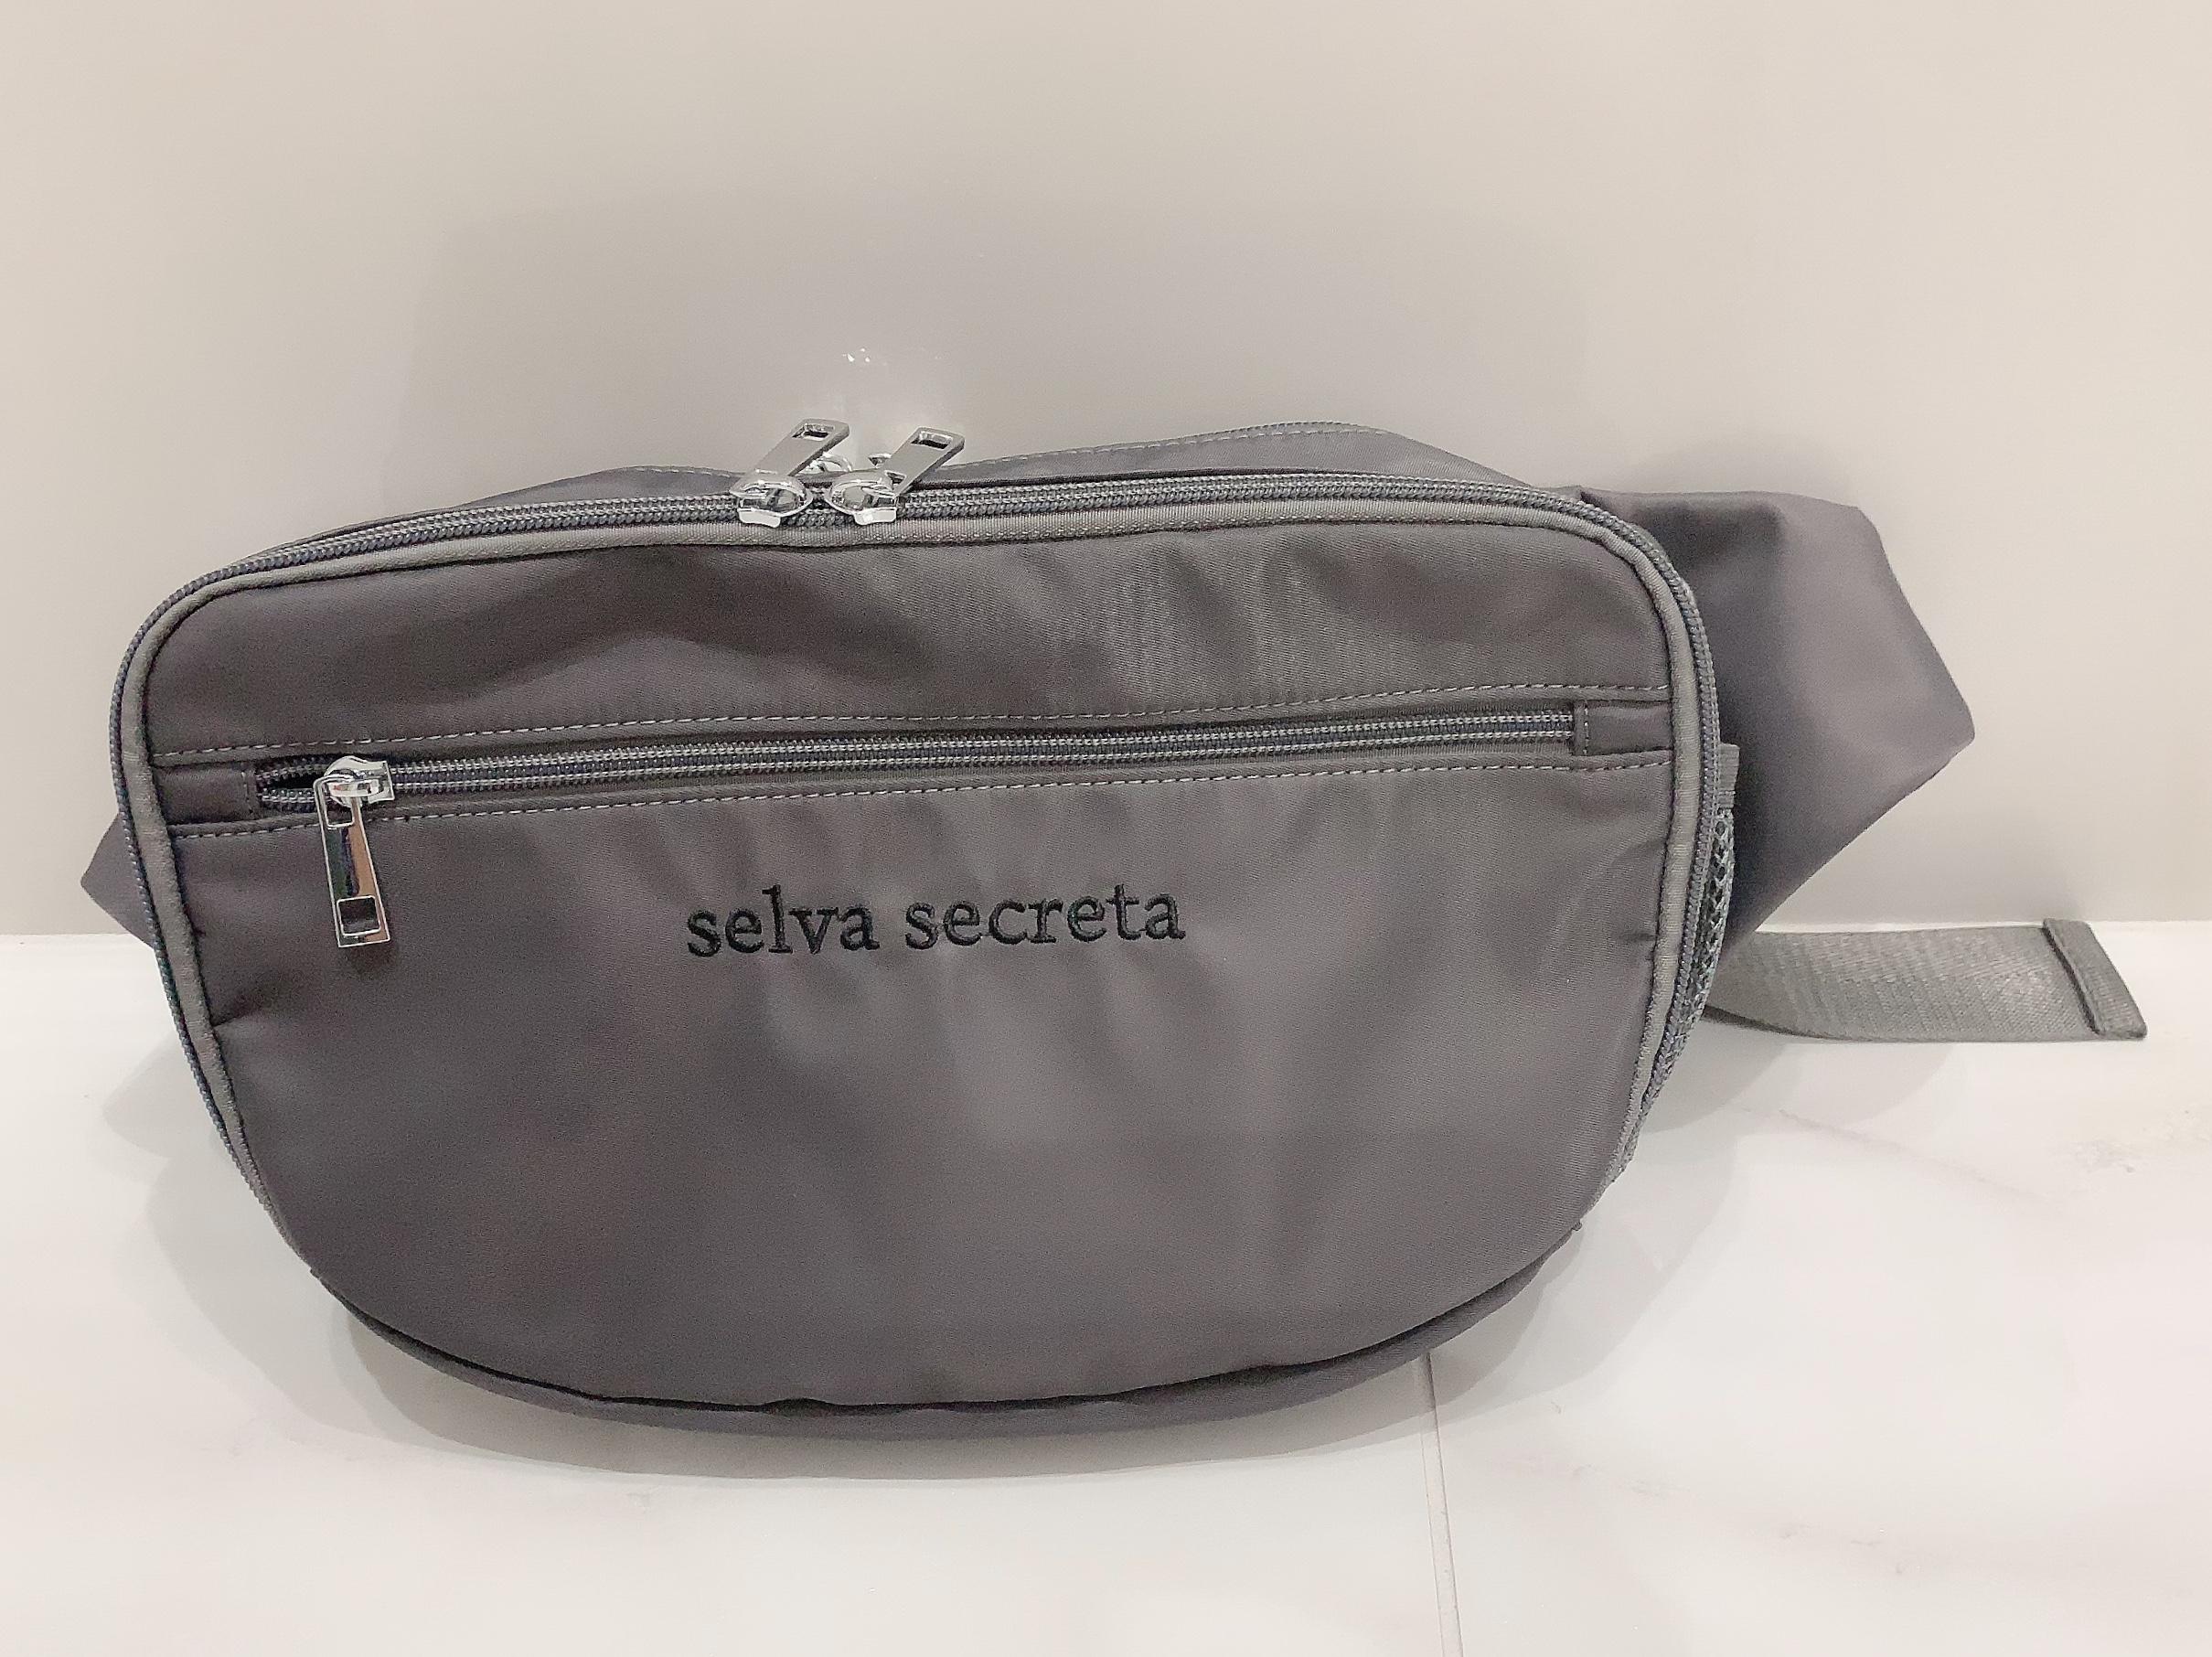 【selva secreta】WAIST POUCH(gray)